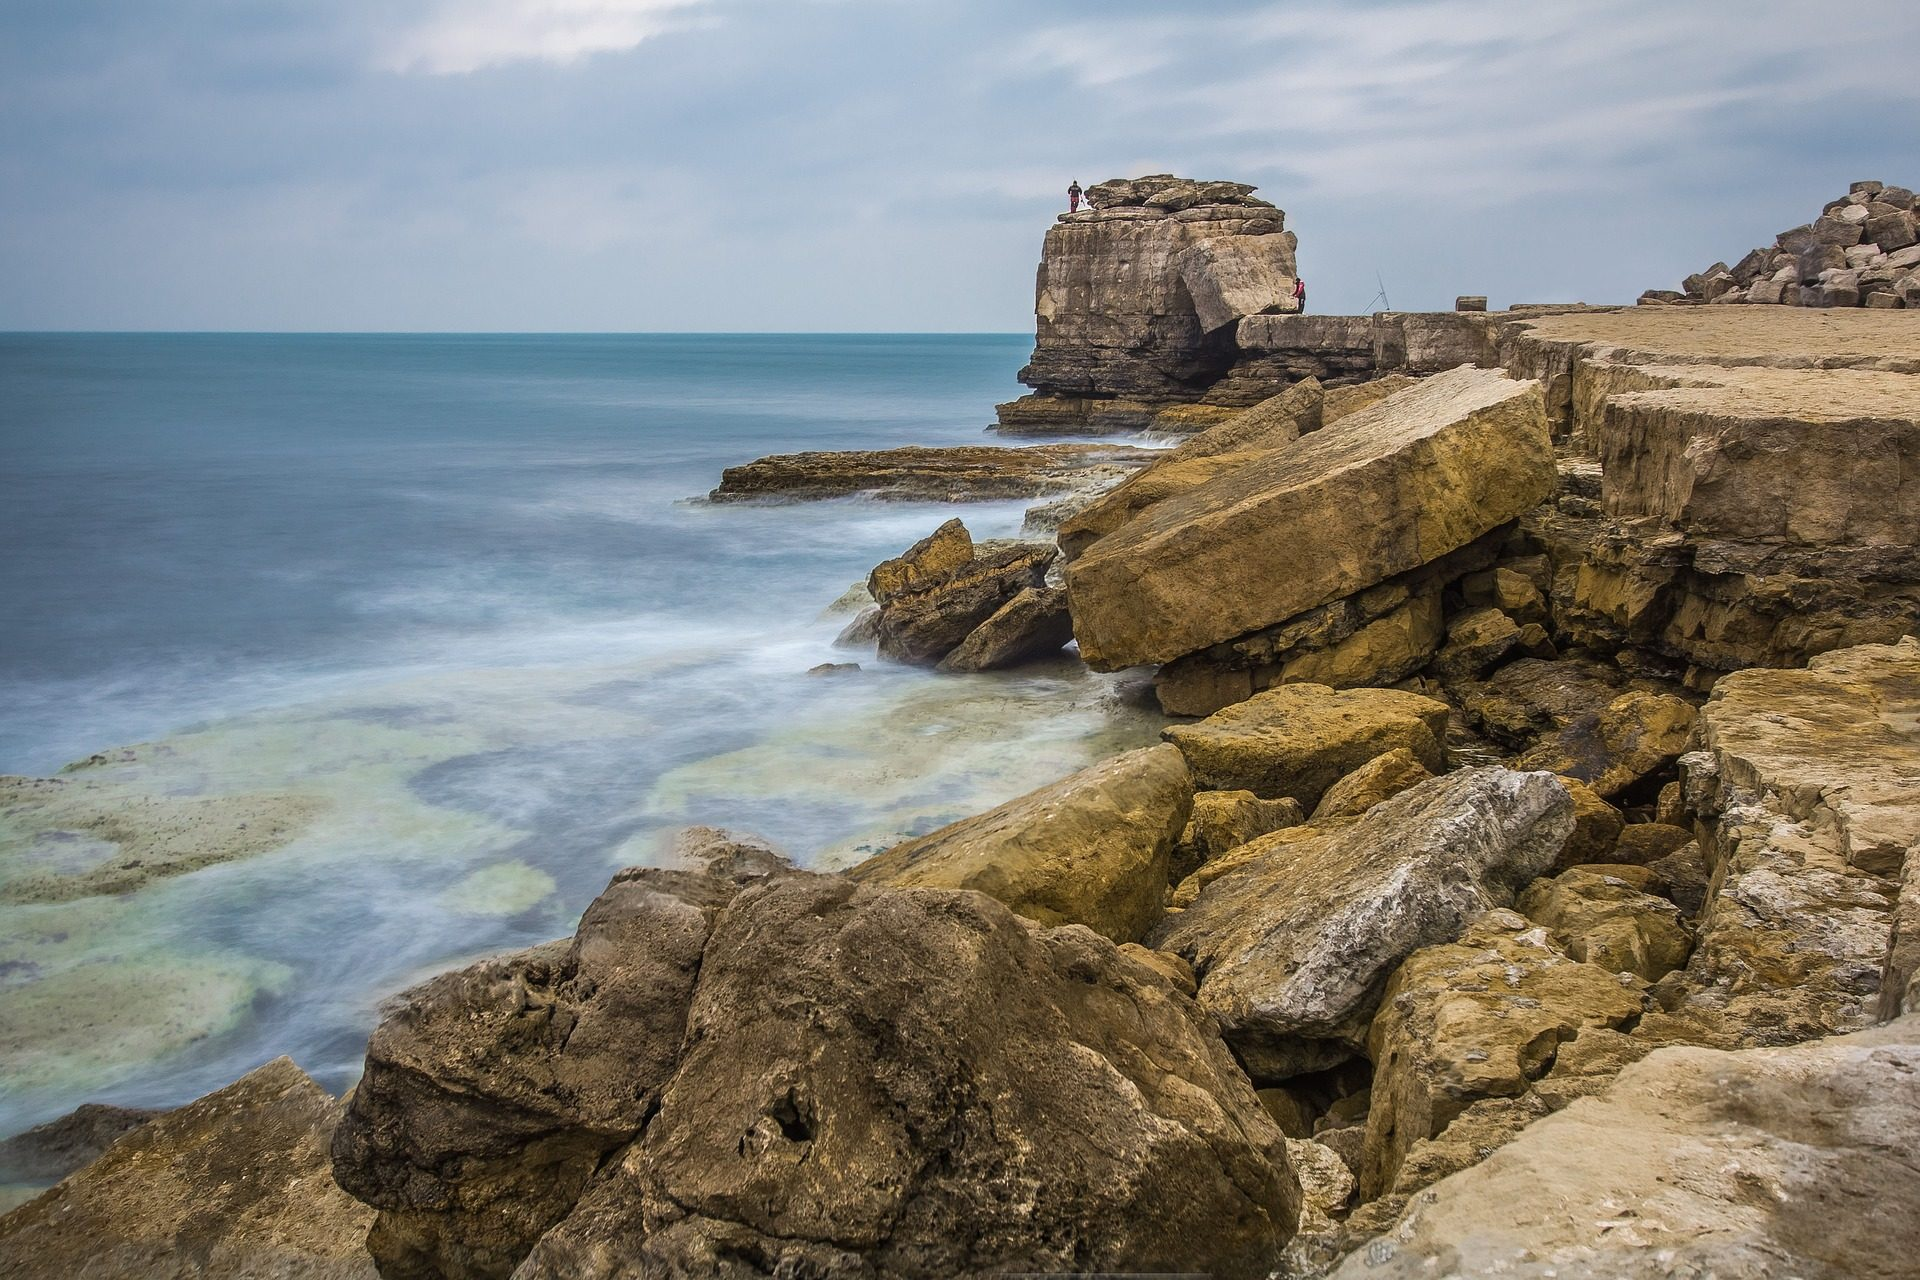 Коста, Море, Риф, камни, Портленд, Англия - Обои HD - Профессор falken.com